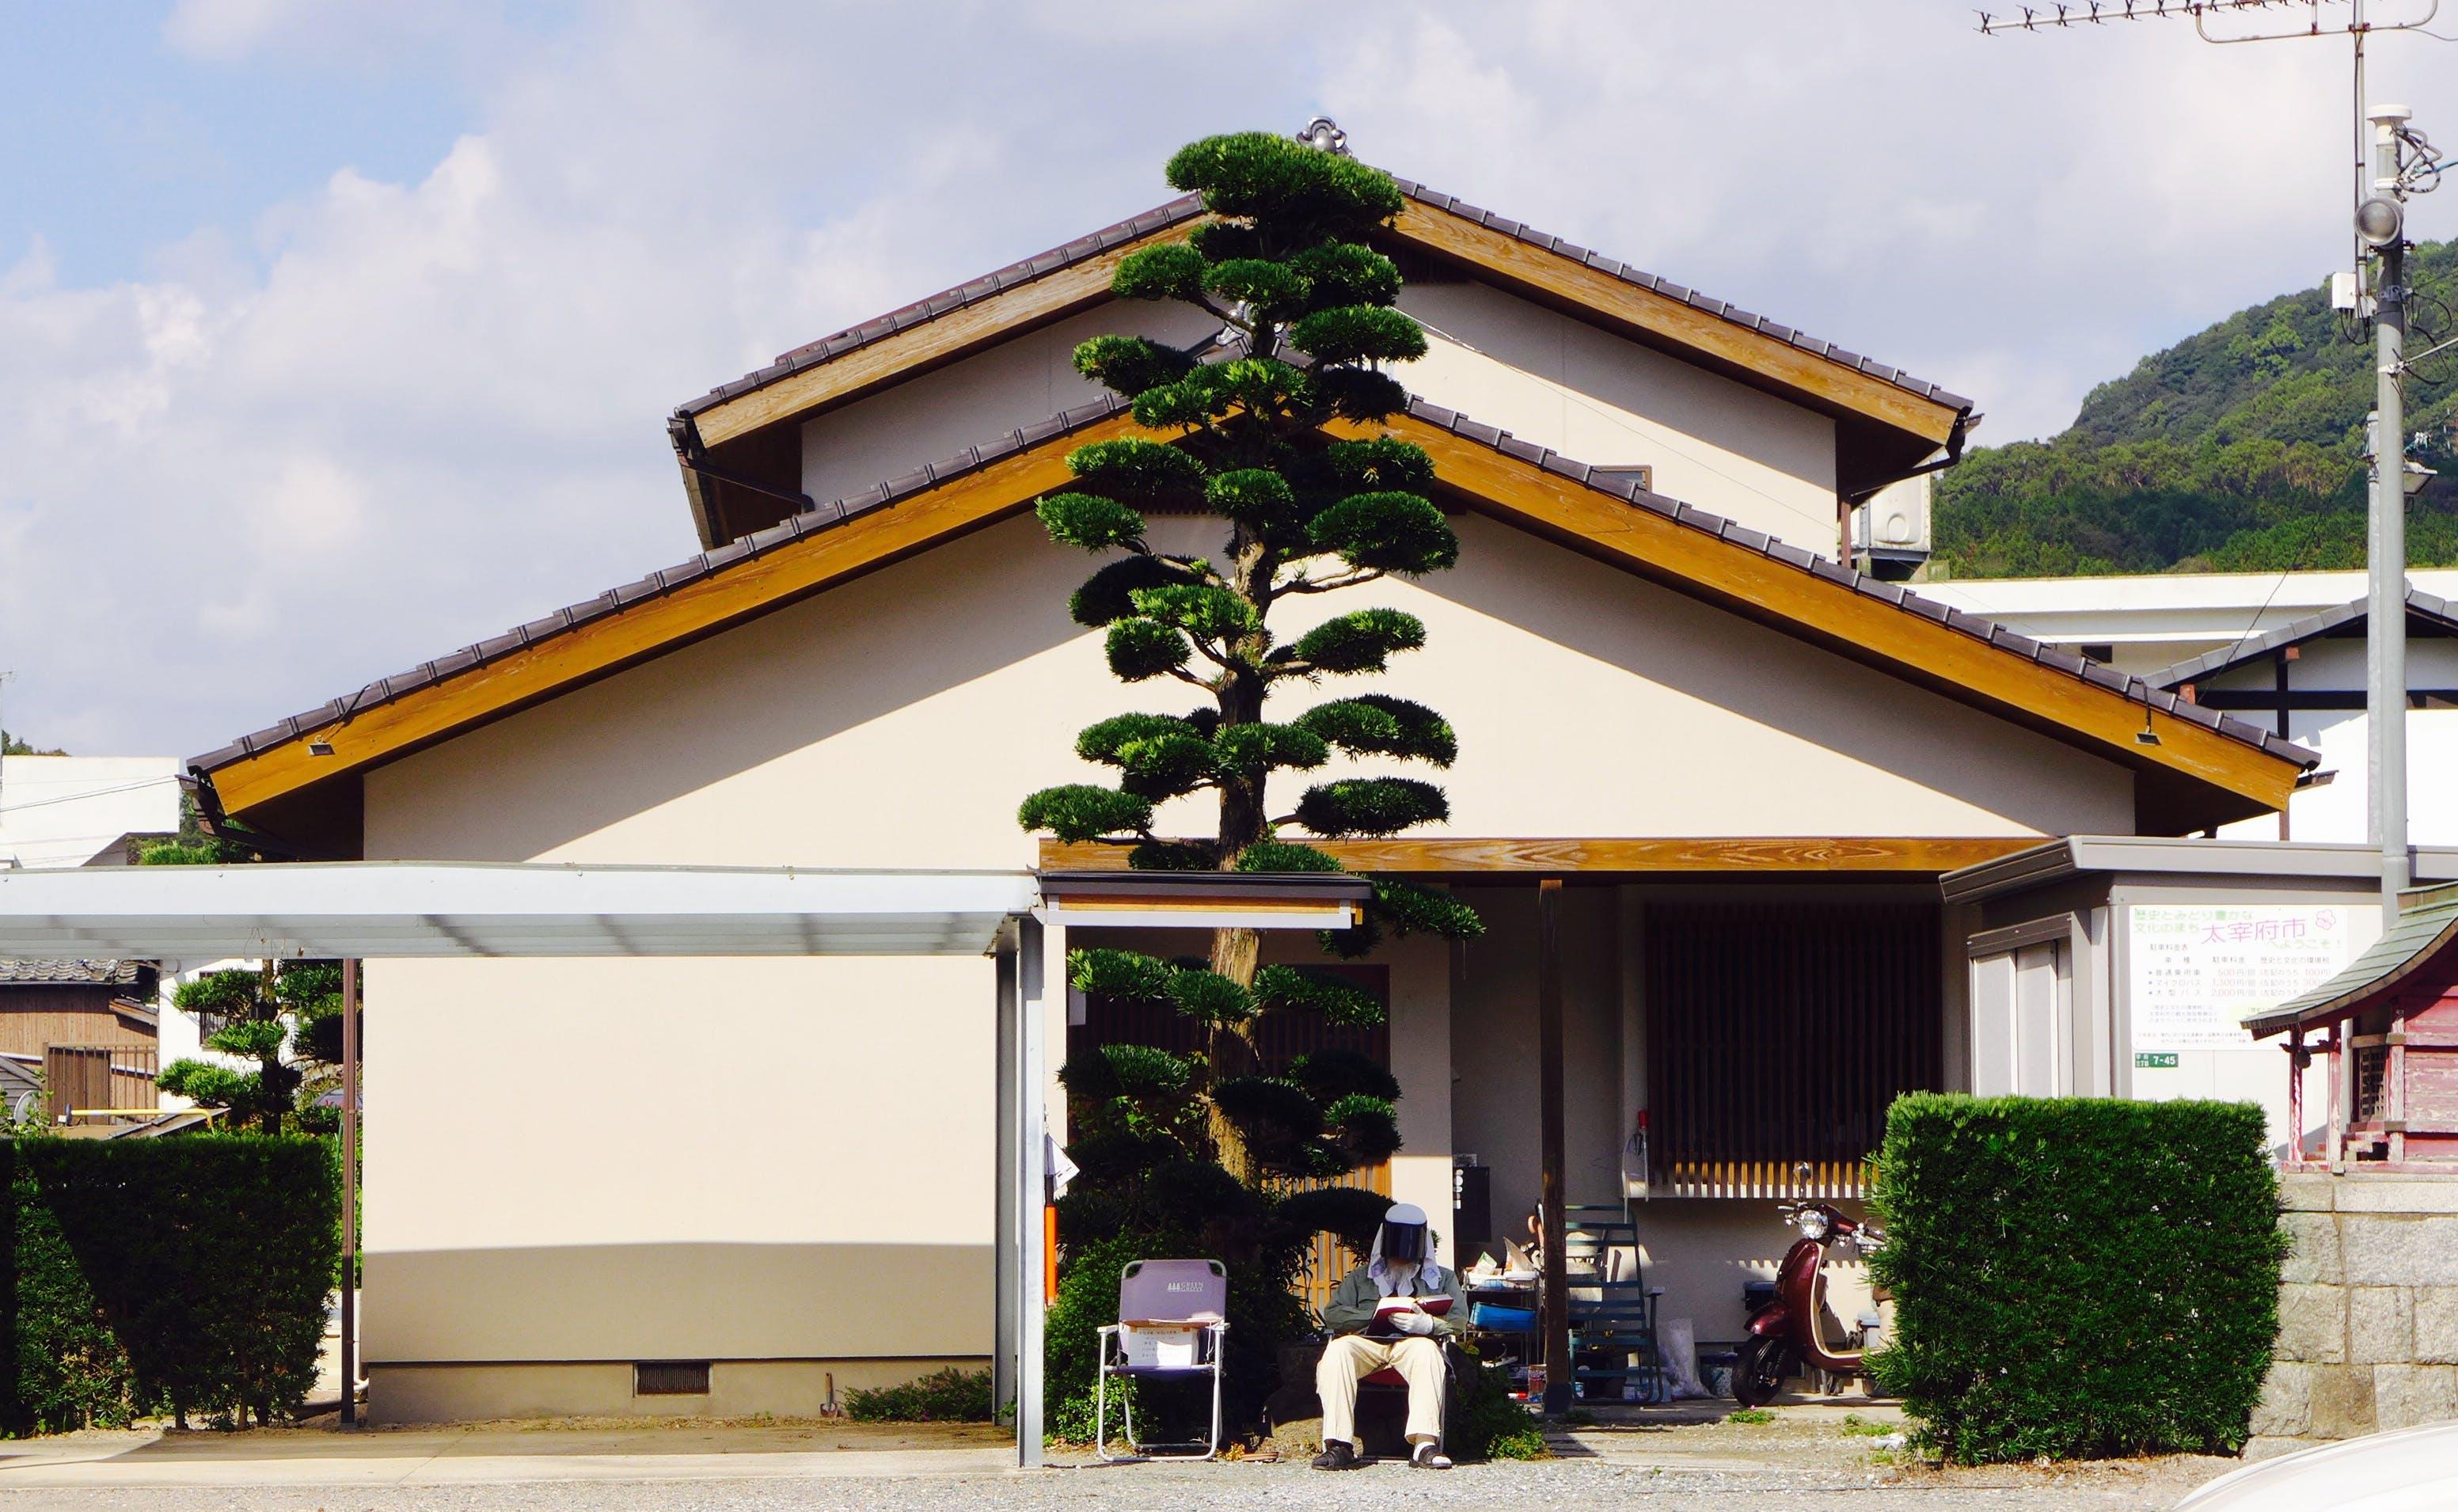 Free stock photo of Japanese House